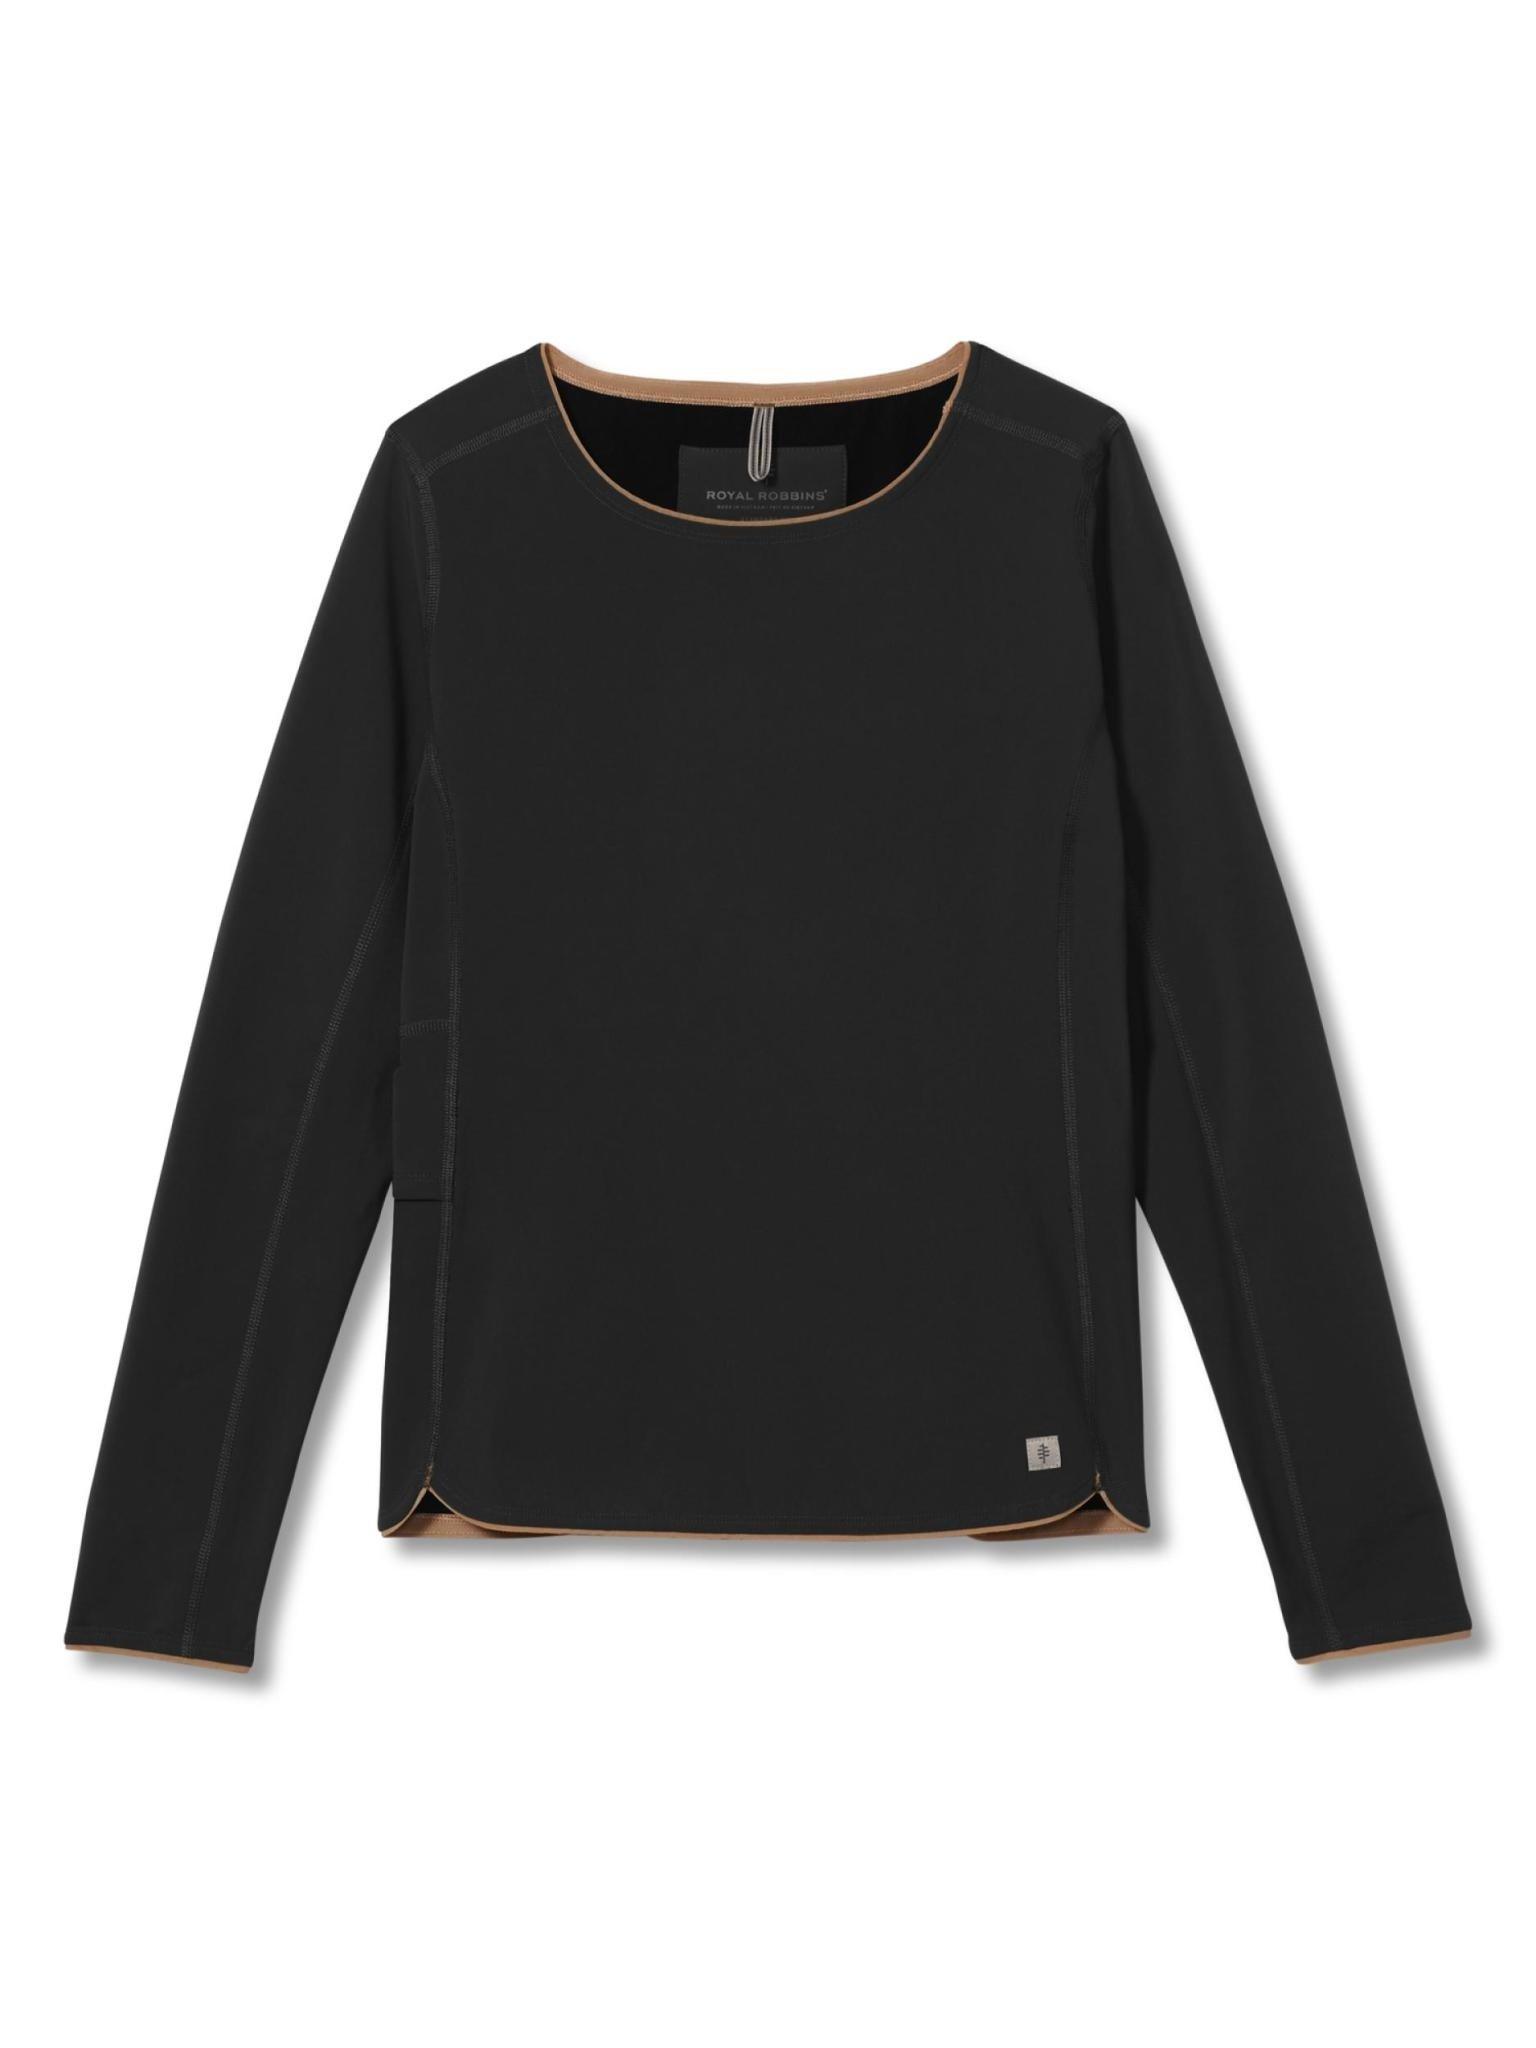 Royal Robbins Venturelayer Fleece Pullover